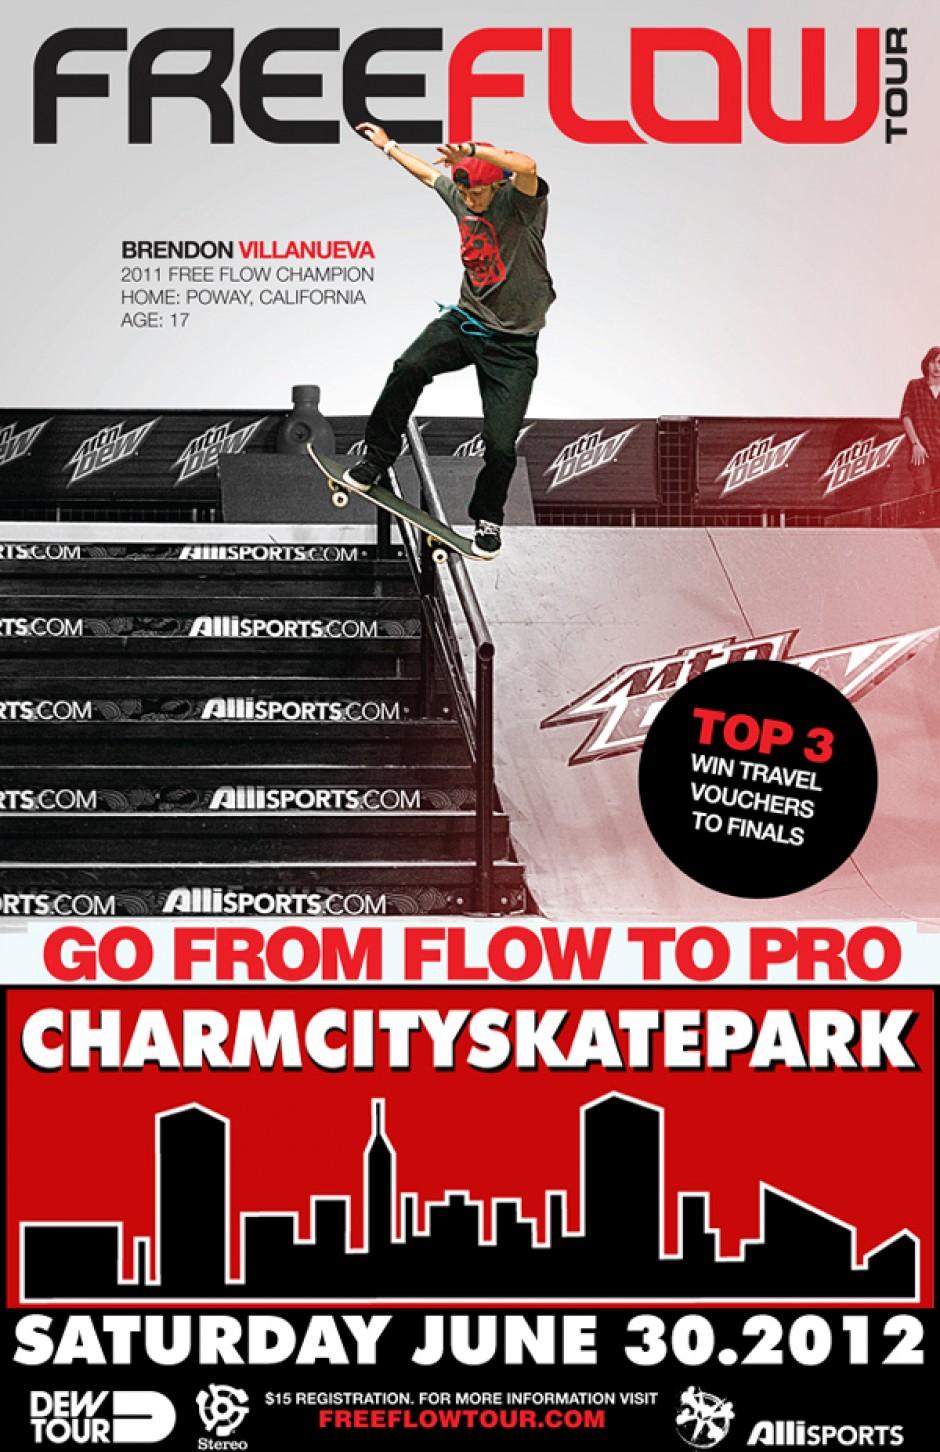 Free Flow Tour at Charmcity Skatepark